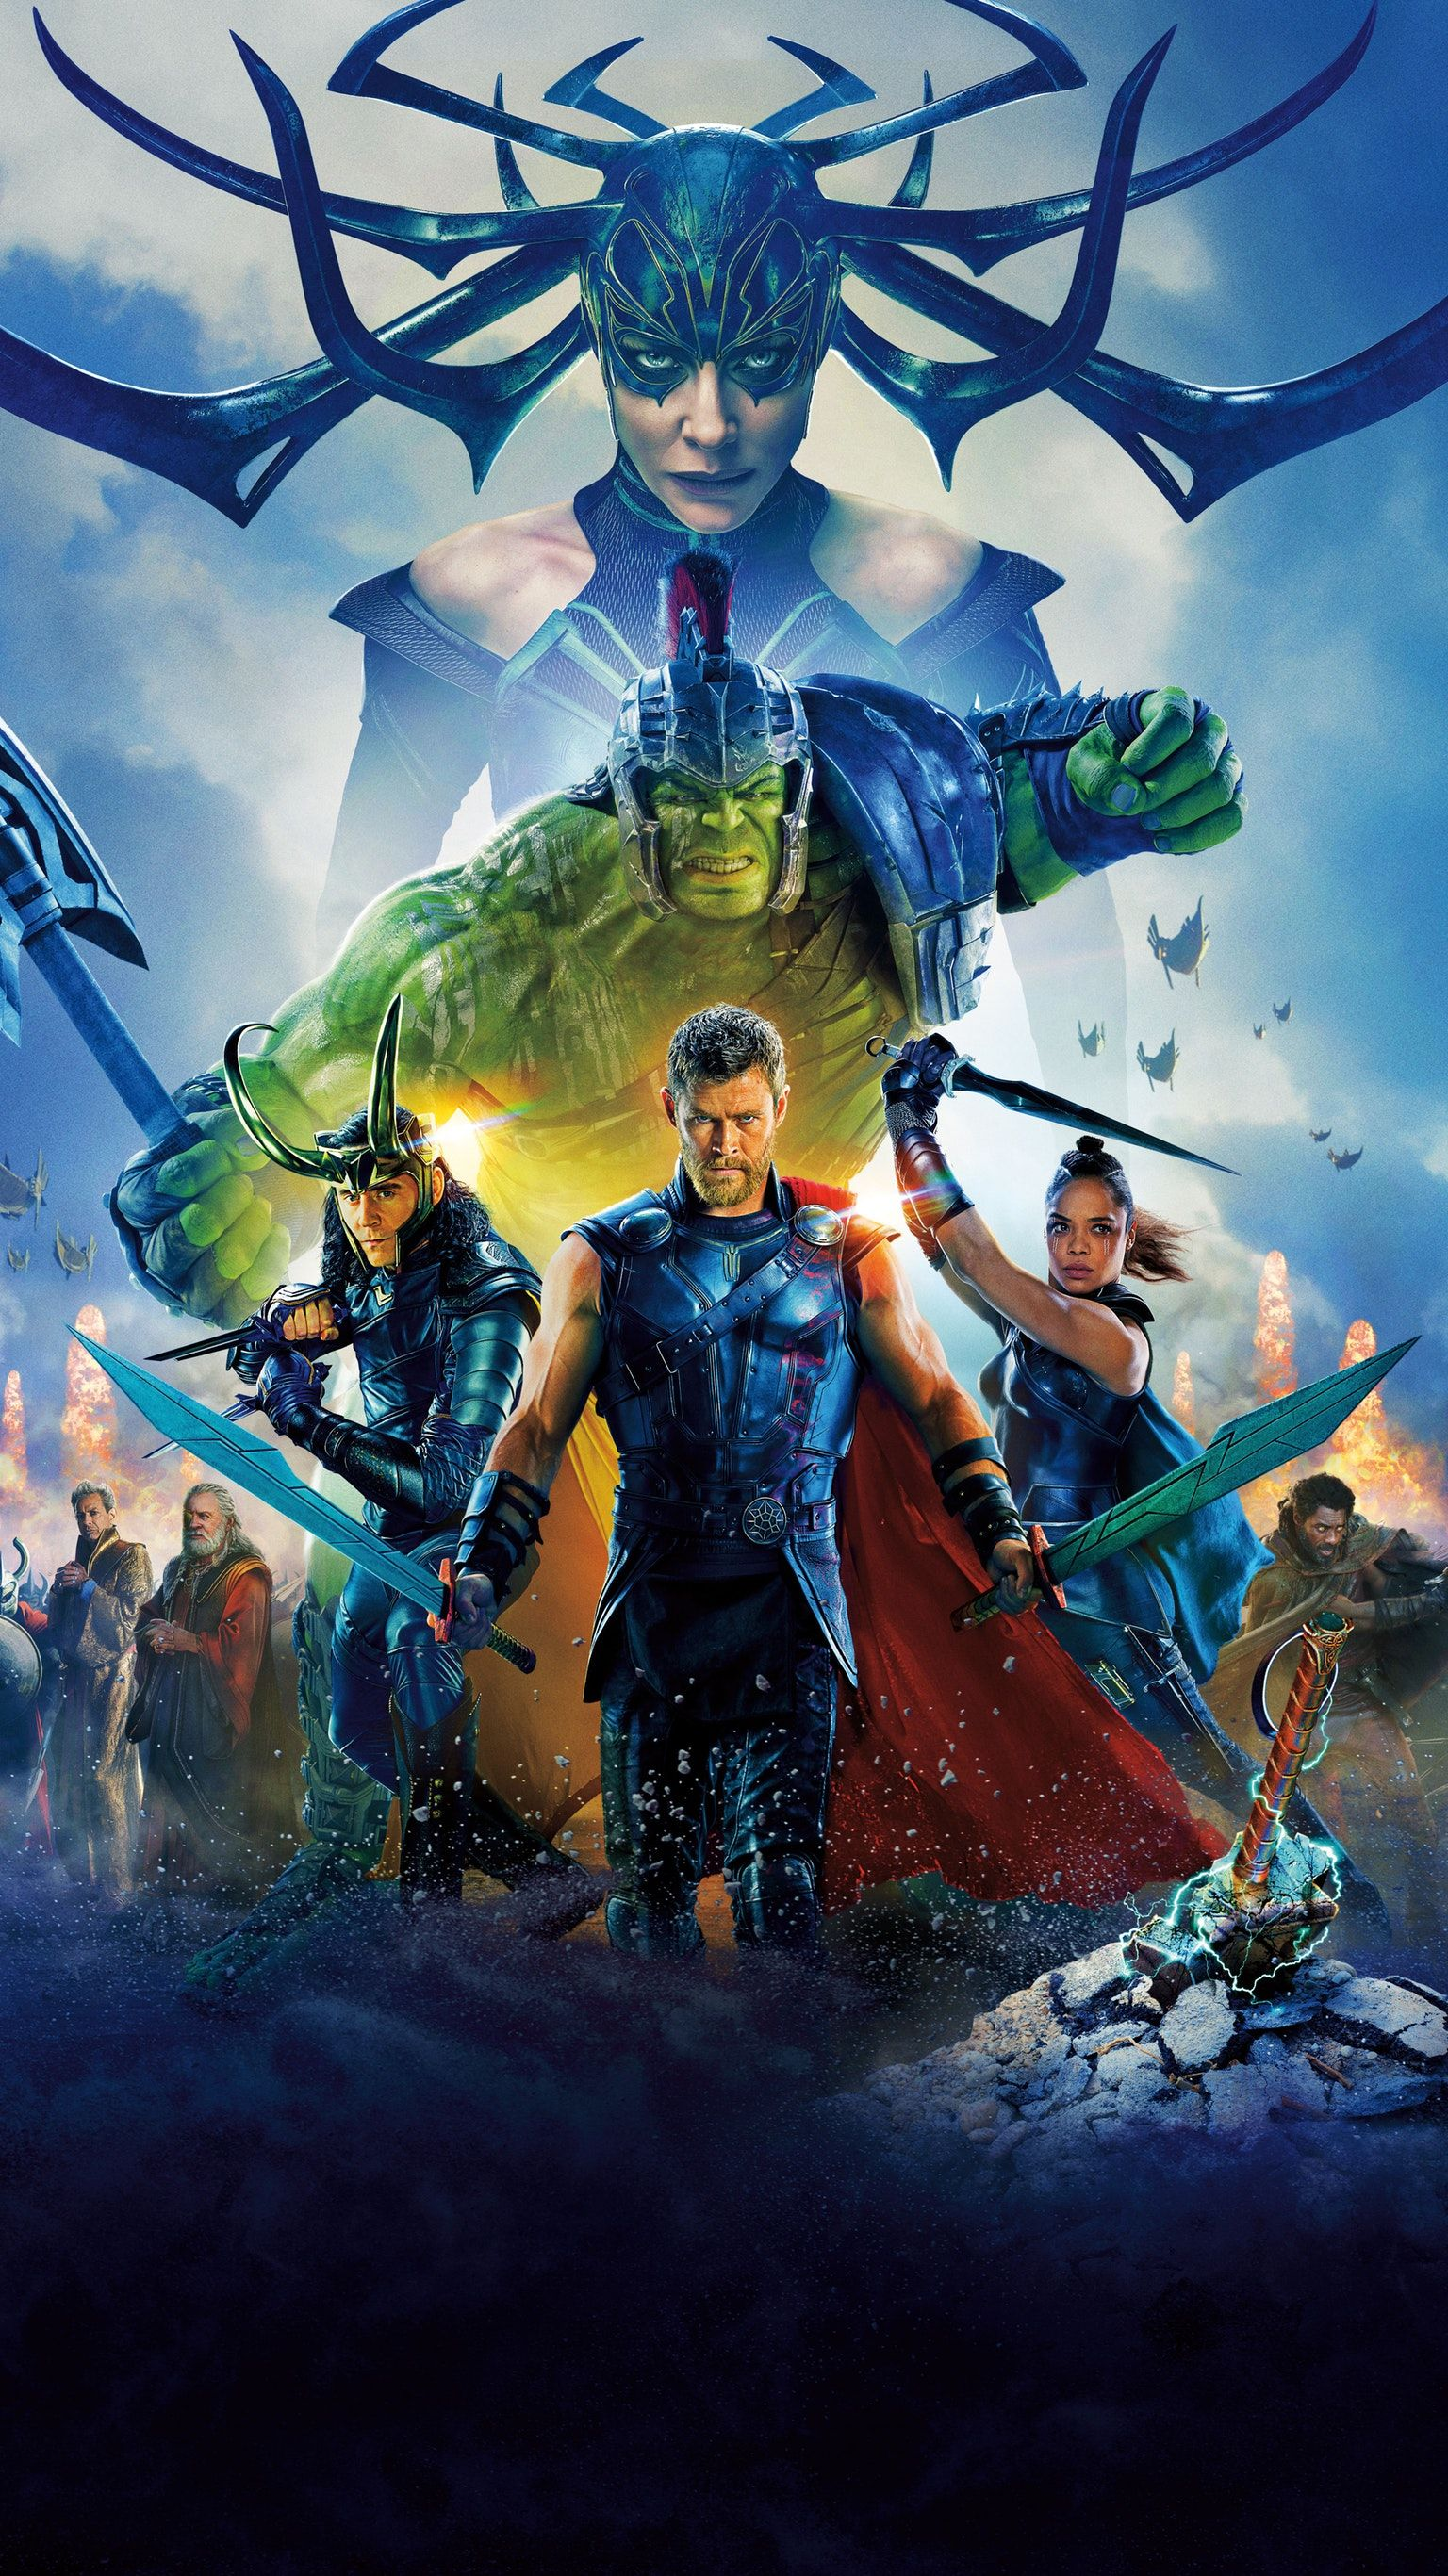 Thor Ragnarok 2017 Phone Wallpaper Moviemania Thor Ragnarok Full Movie Ragnarok Movie Watch Thor